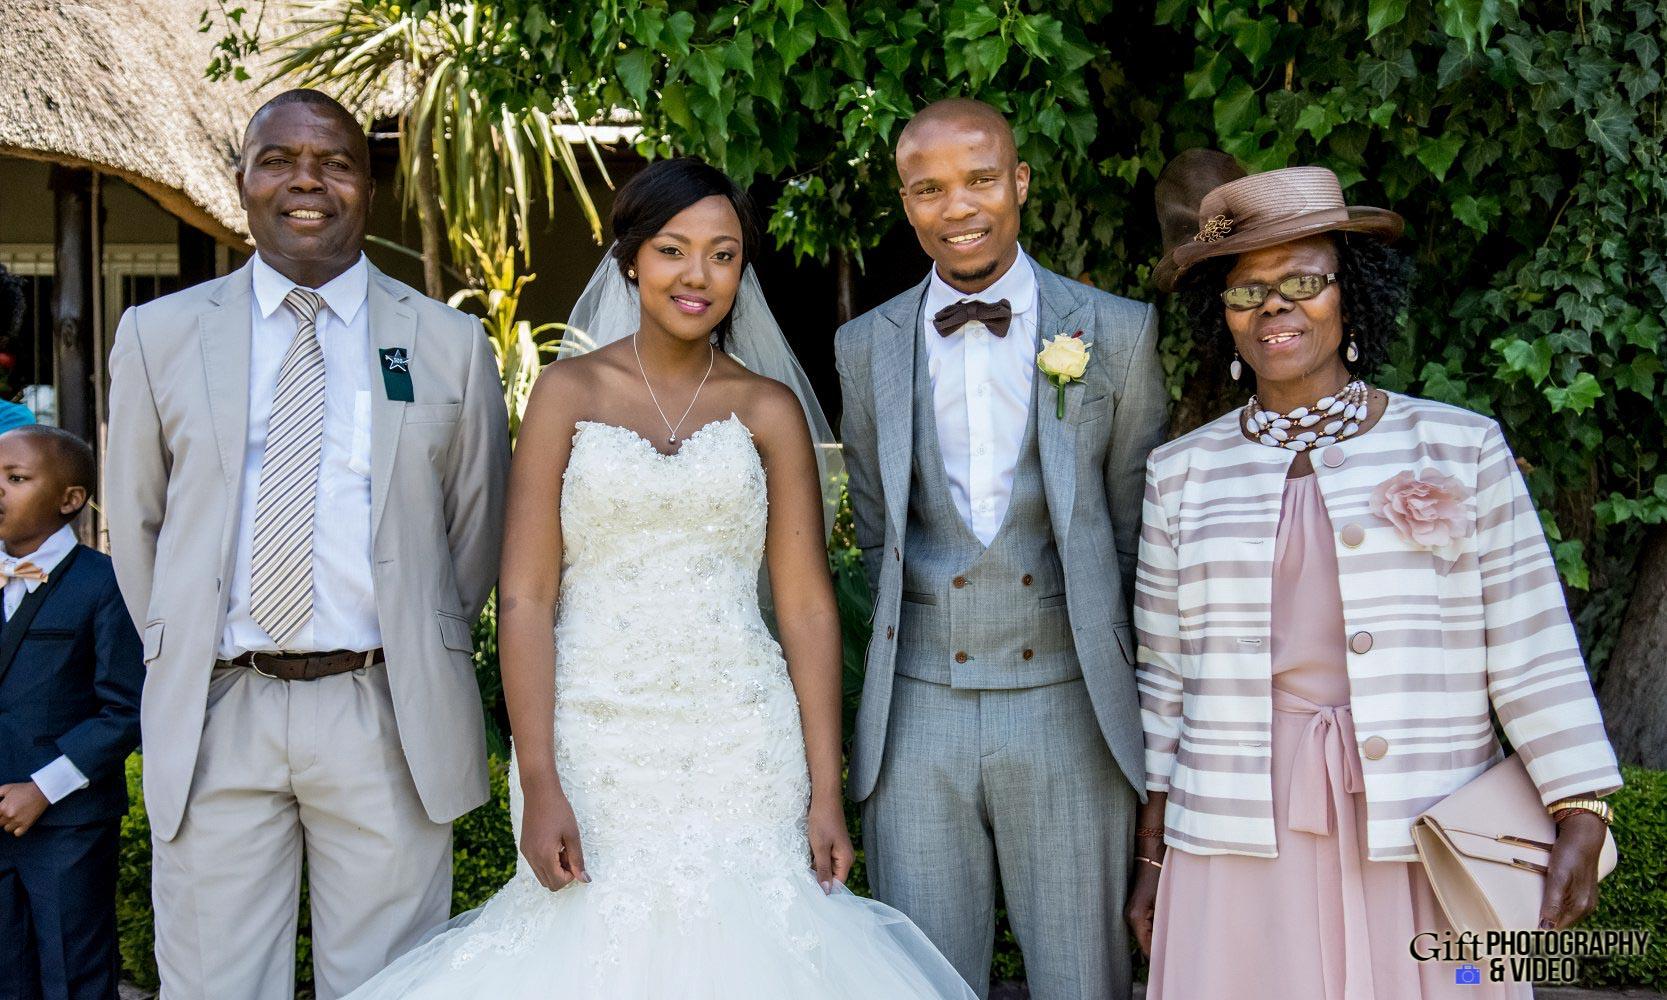 Choene & Sihle Wedding Usambara-39